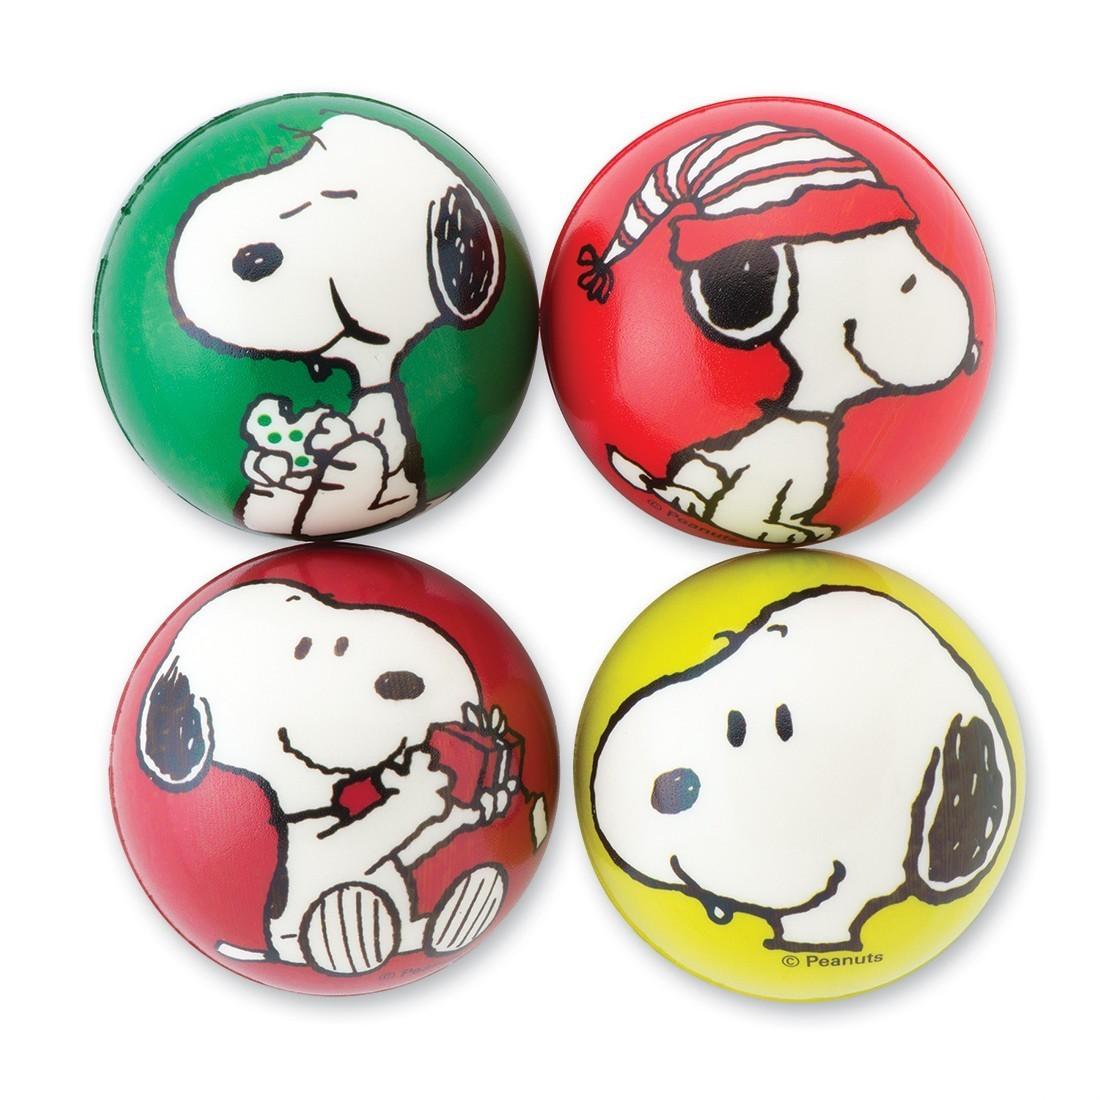 Peanuts® Christmas Stress Balls [image]